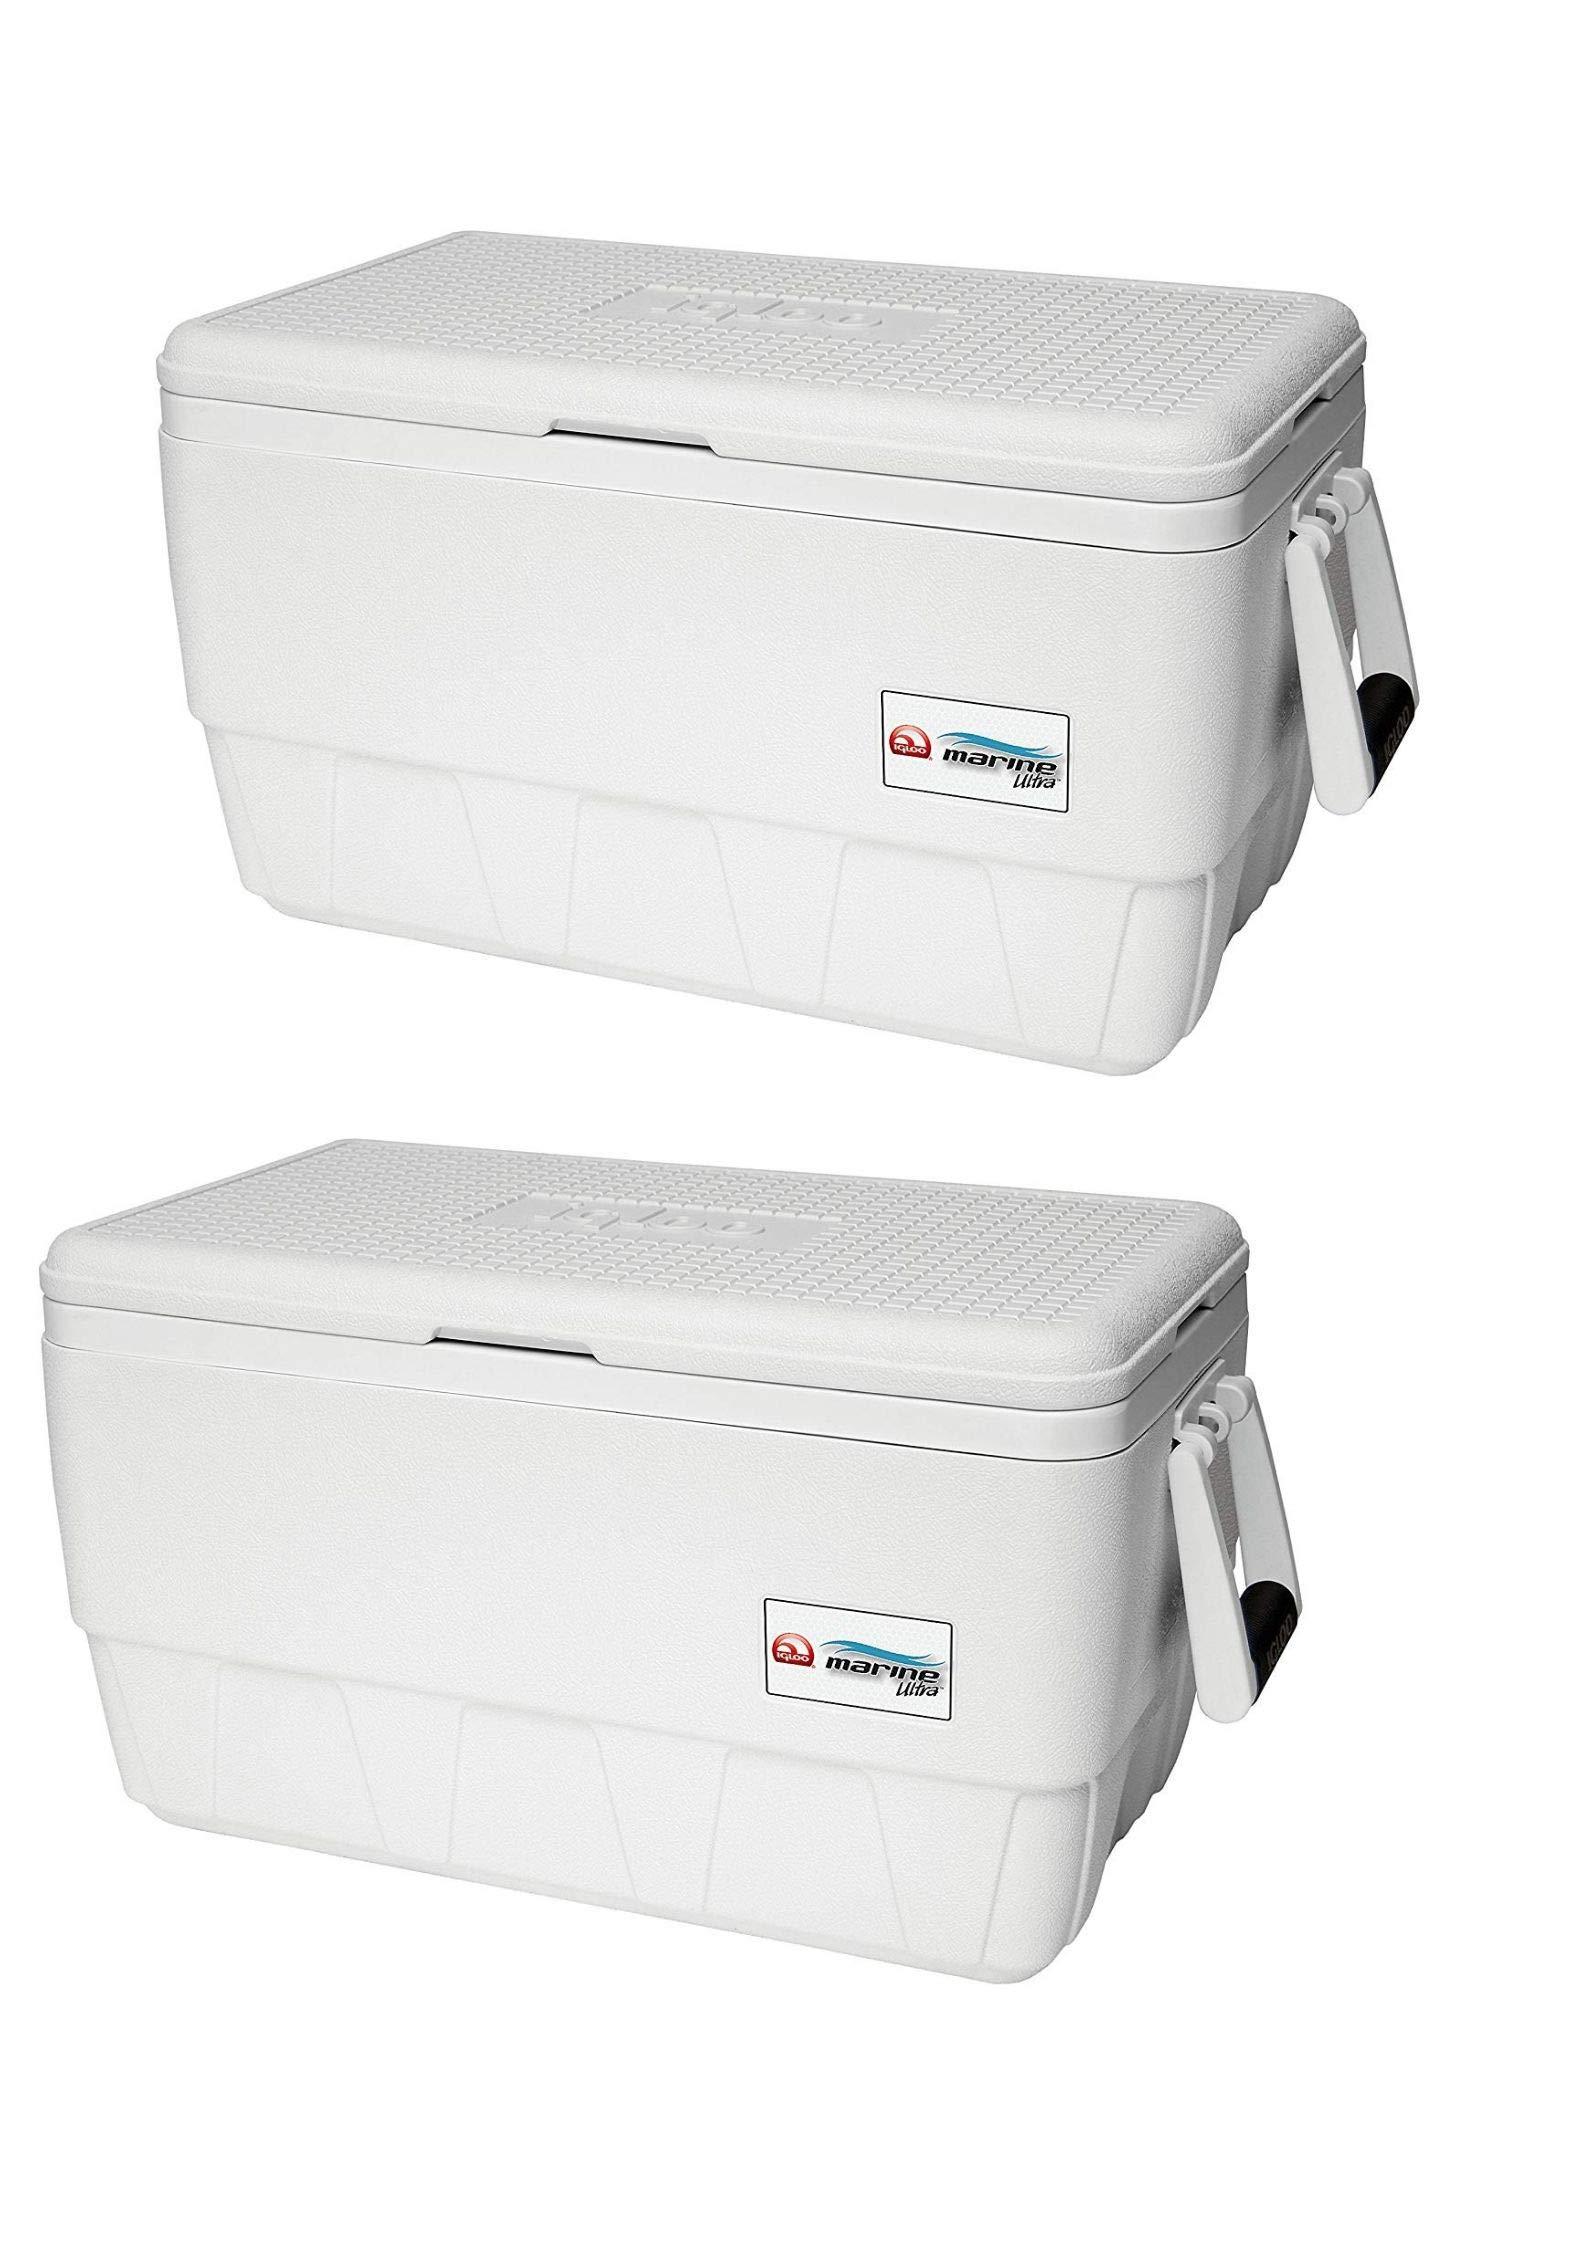 Igloo Marine Ultra 36 Cooler (36-Quart/Pack of 2) by Igloo